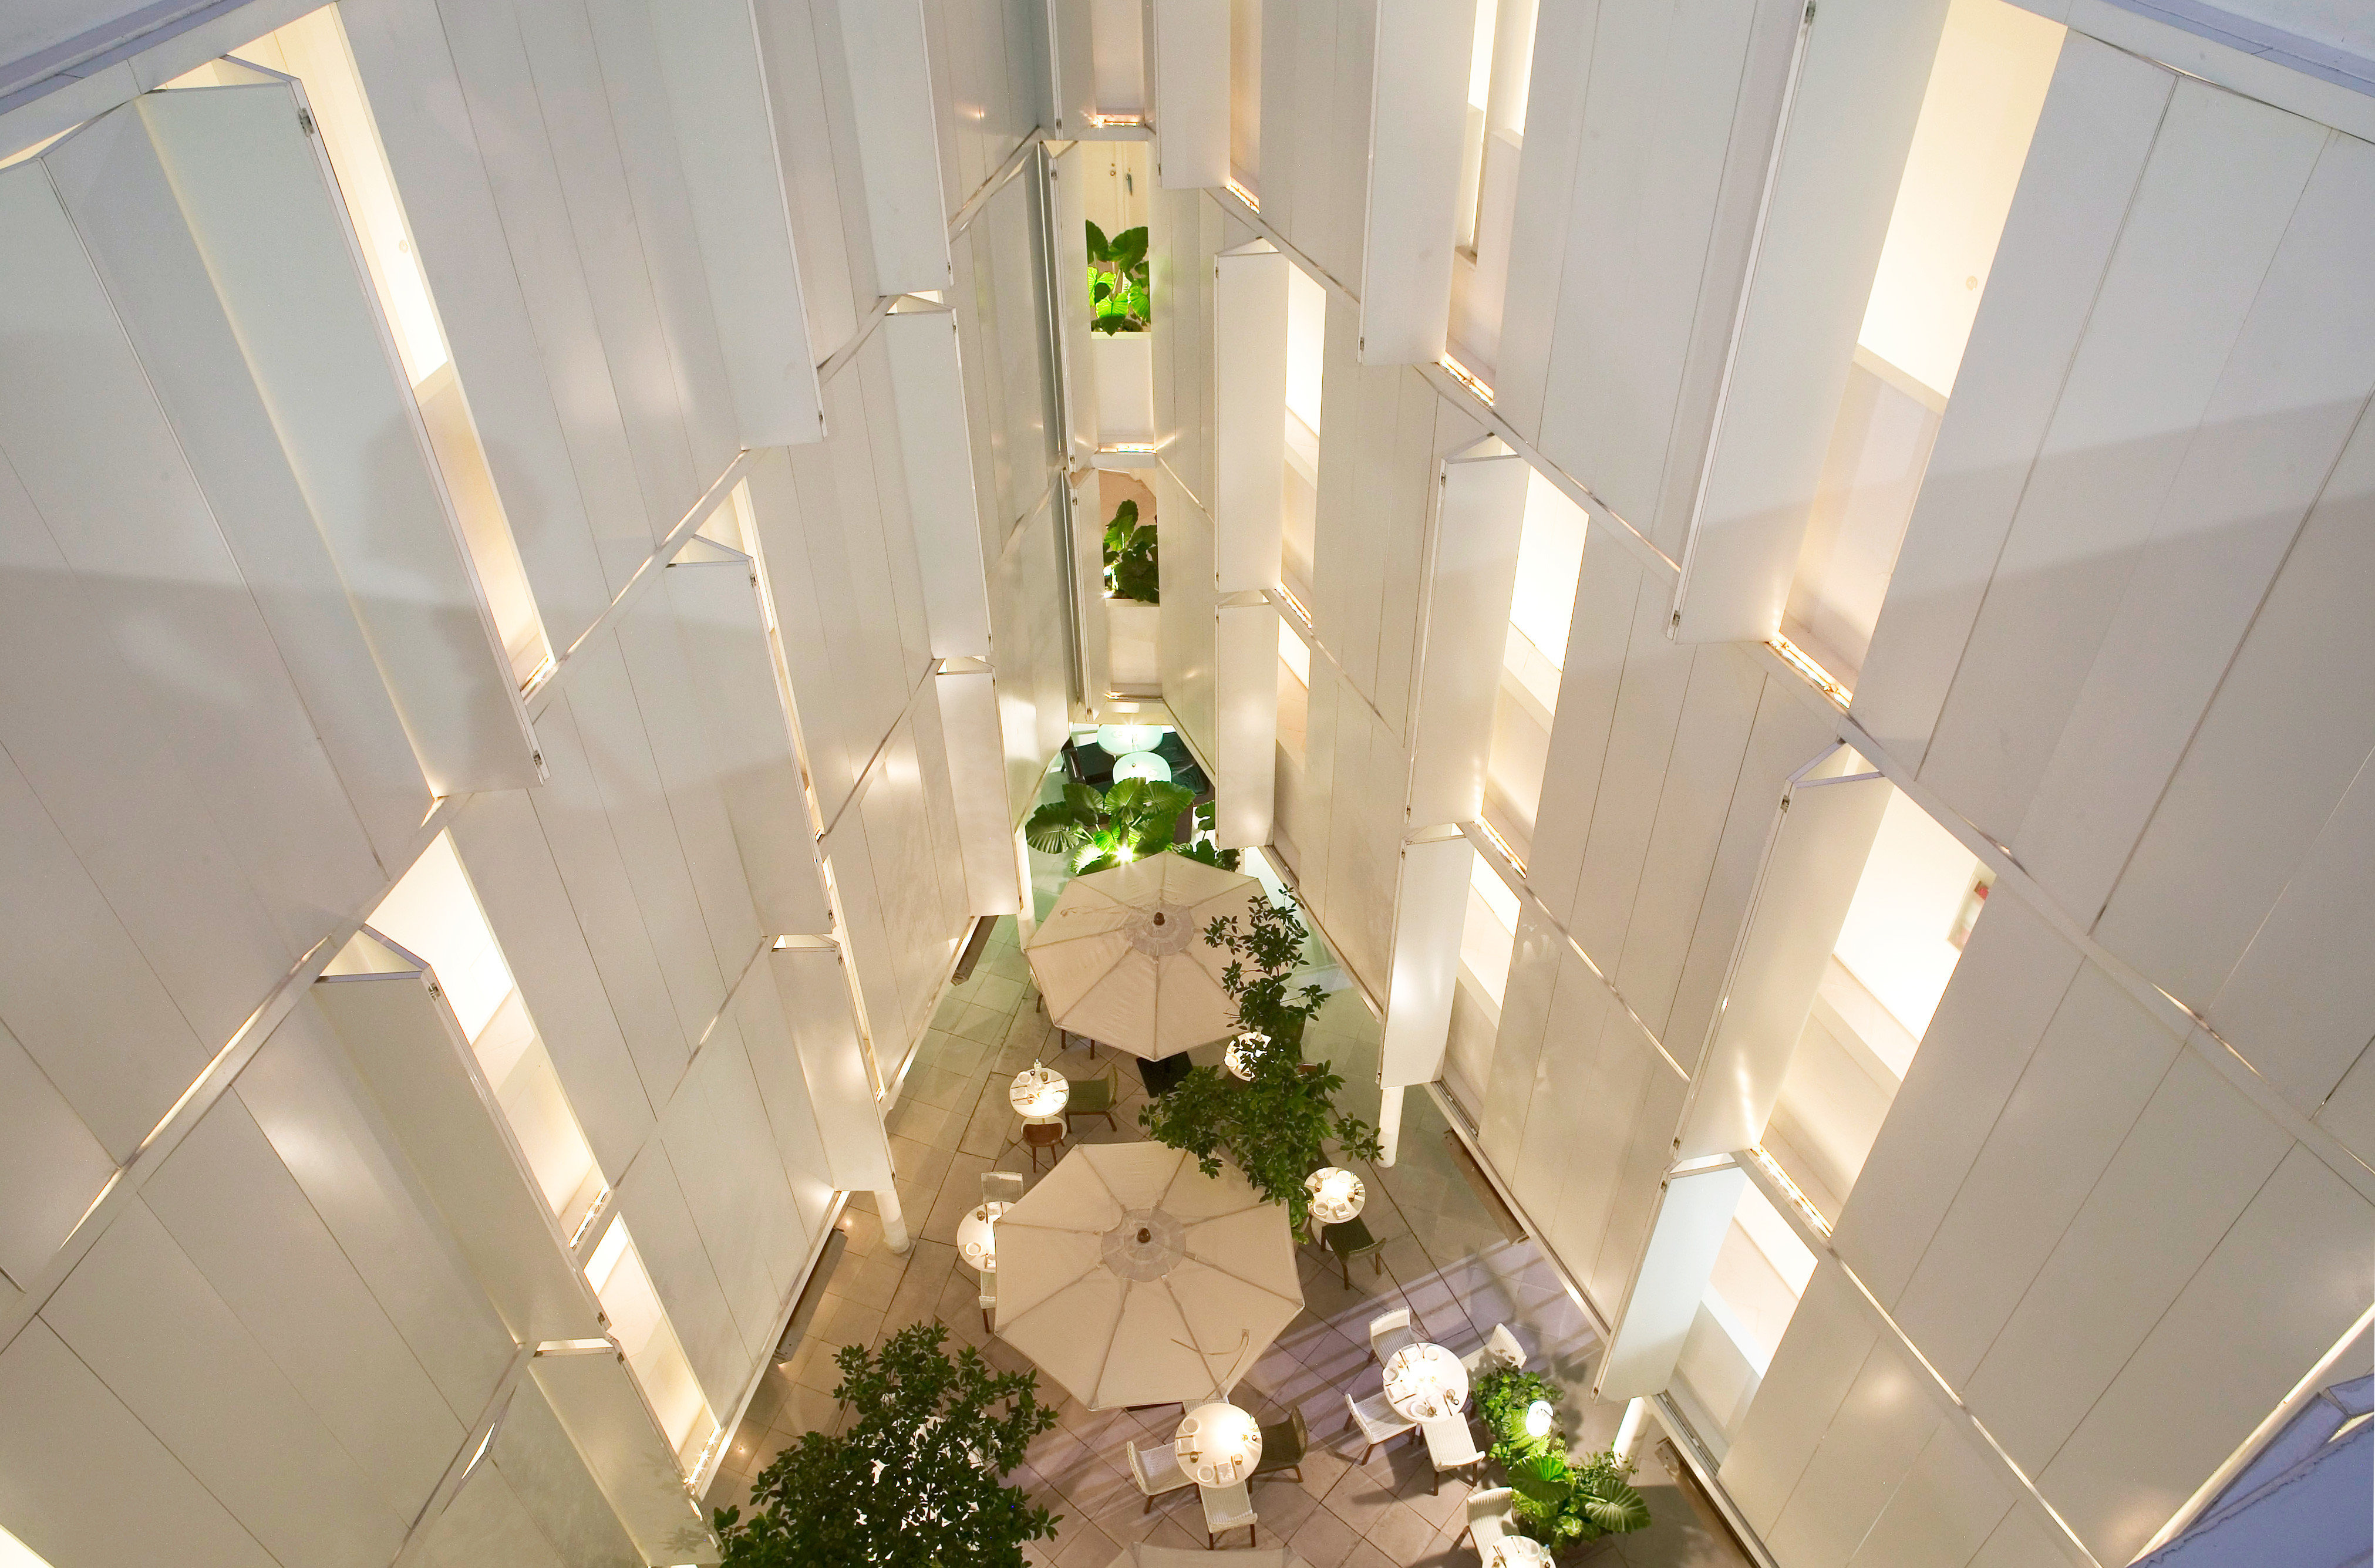 Courtyard Deck Dining Drink Eat Hip Lounge Modern Patio Terrace white green house home wedding flower